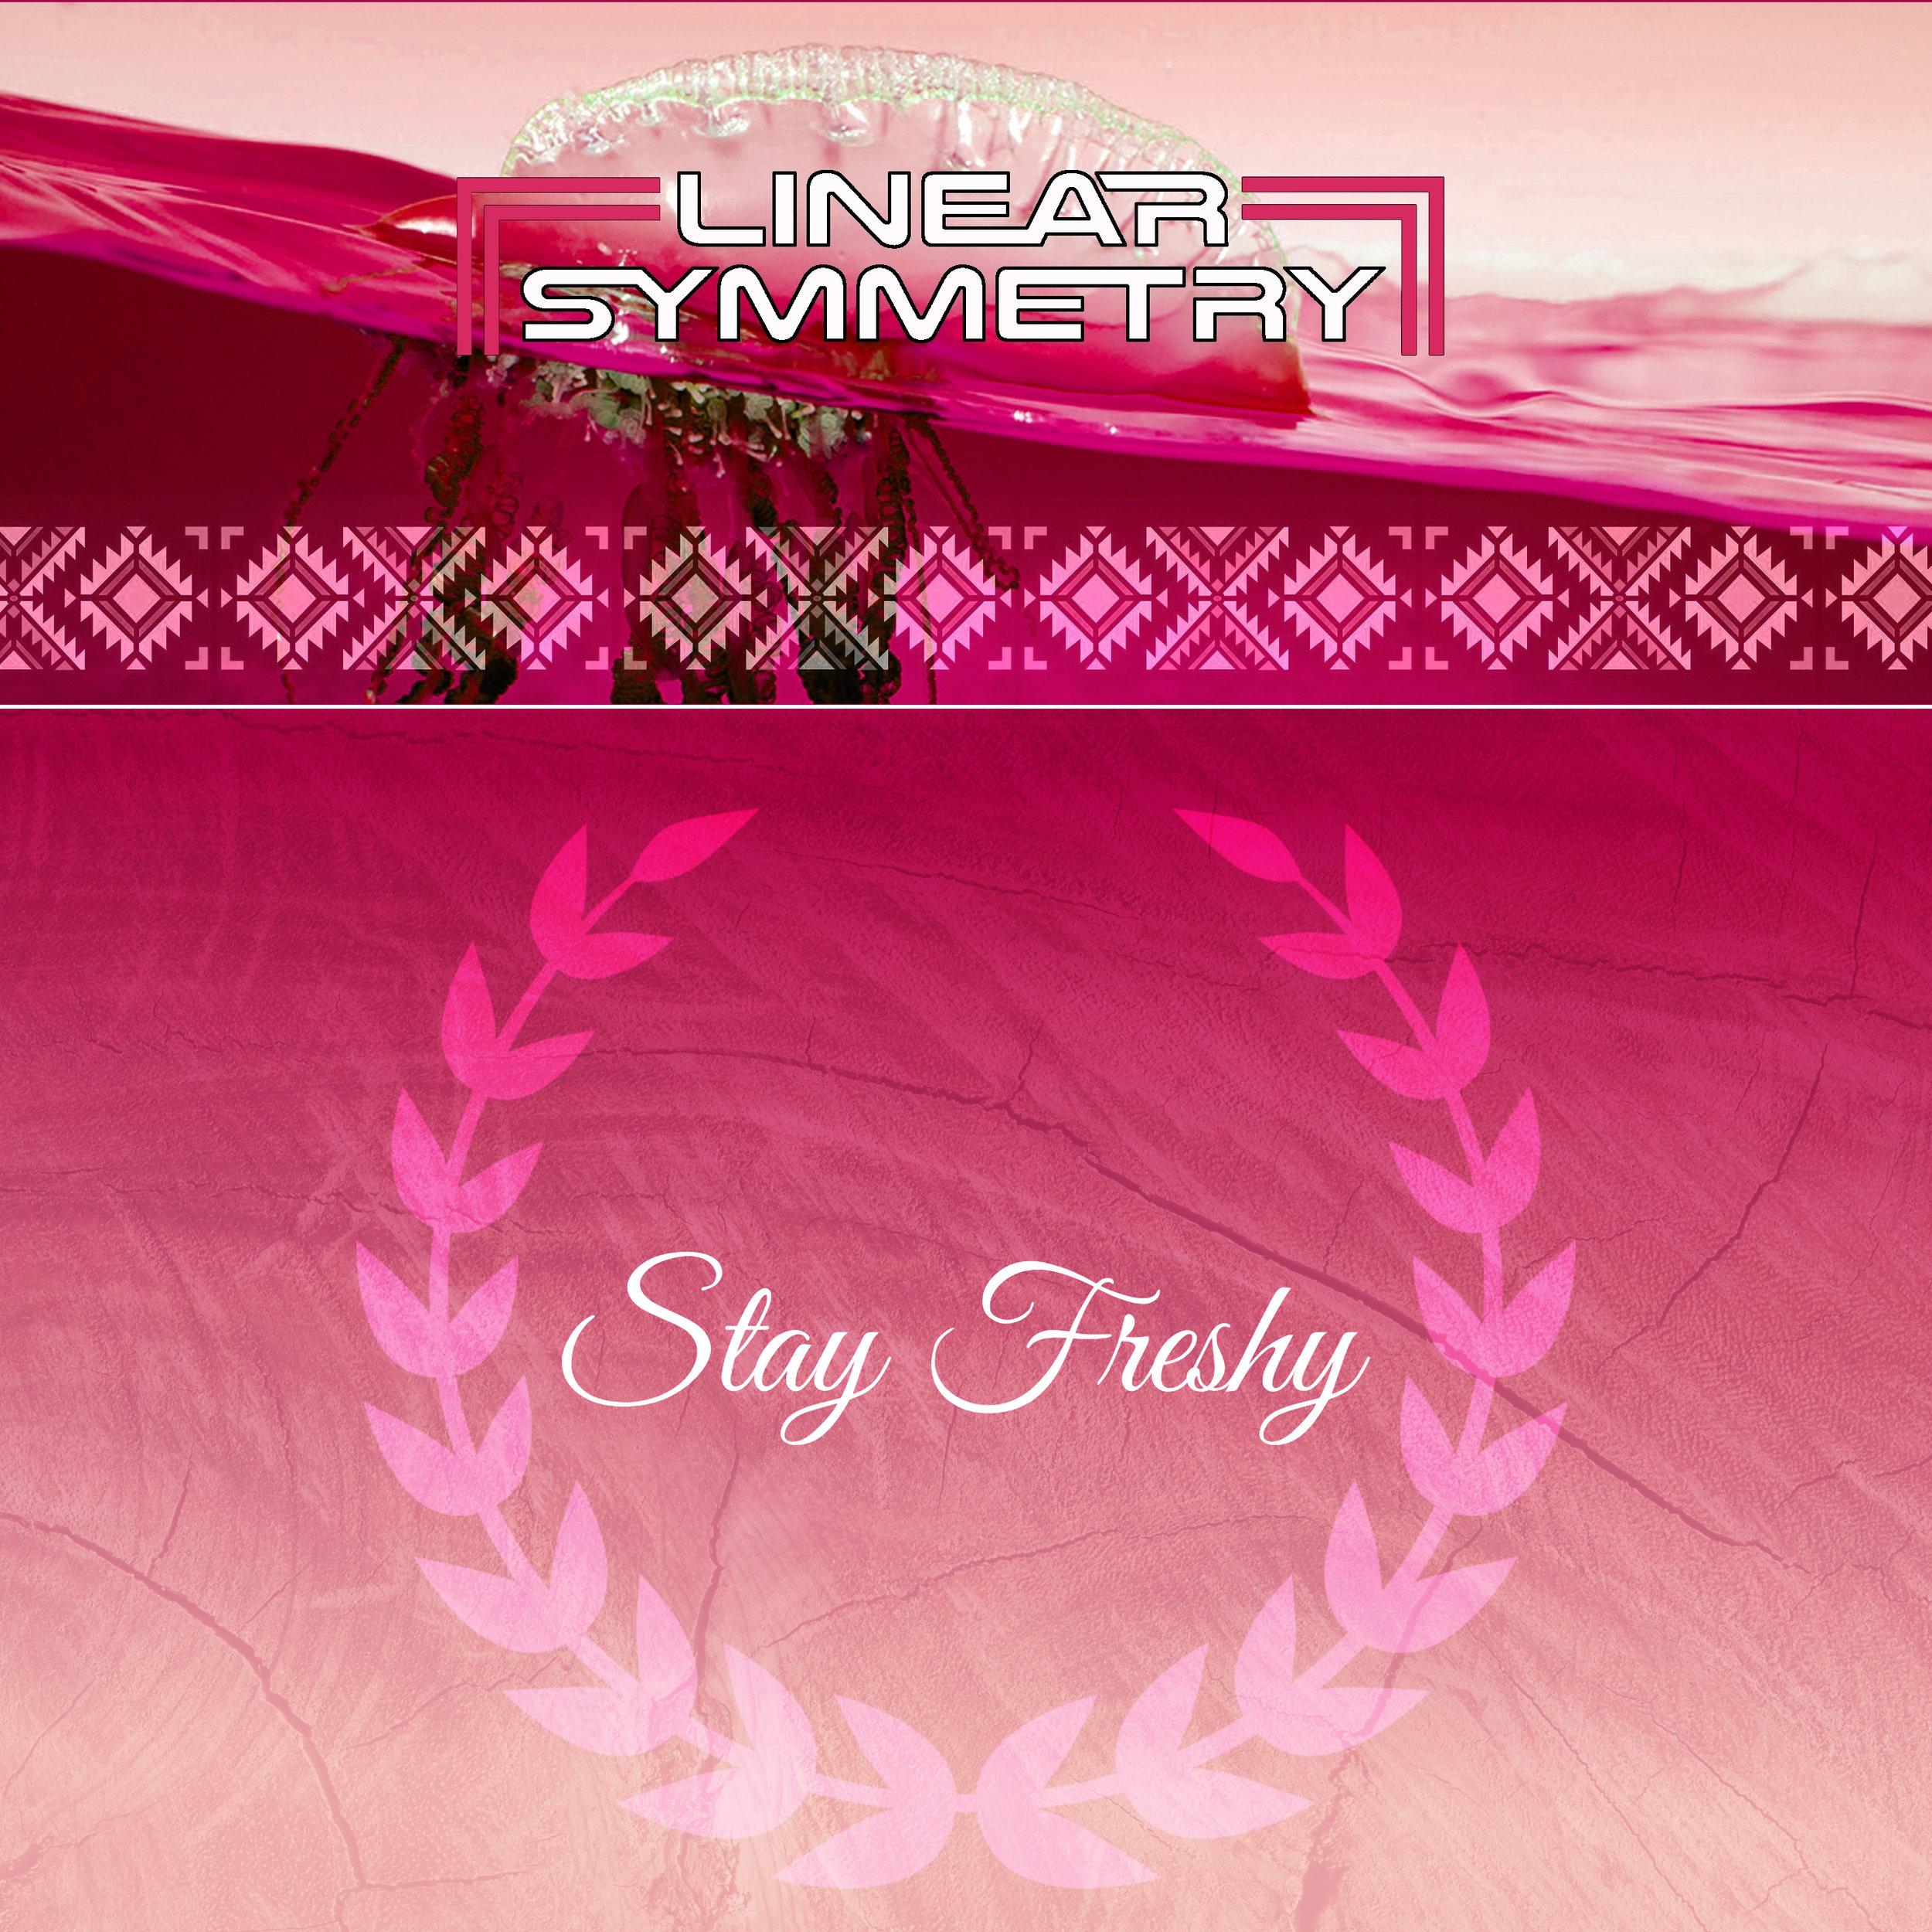 Stay Freshy (Album)